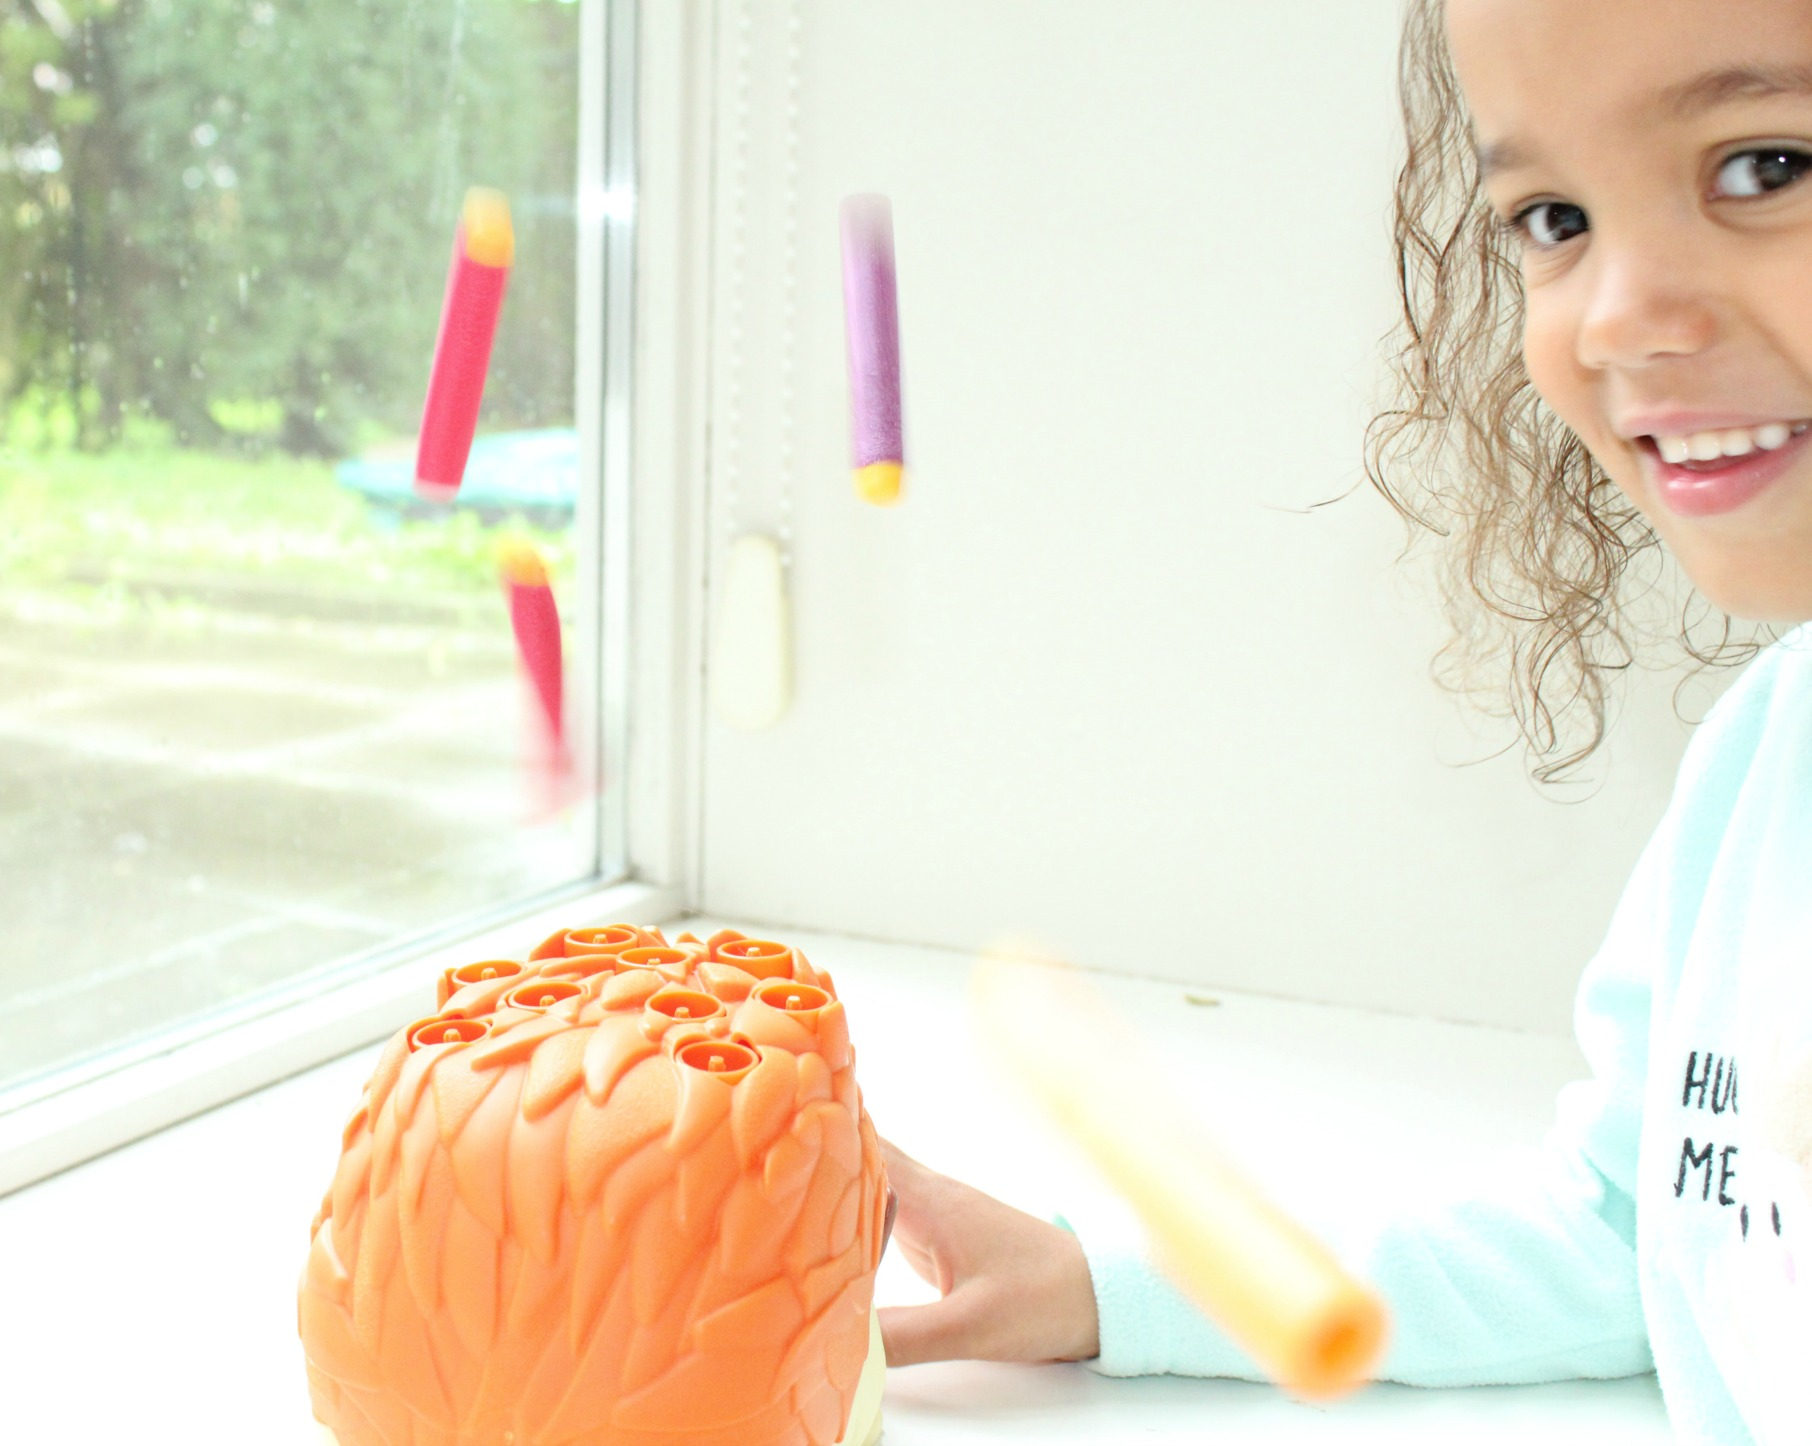 Review Egeltje Plof The Millennial Mom